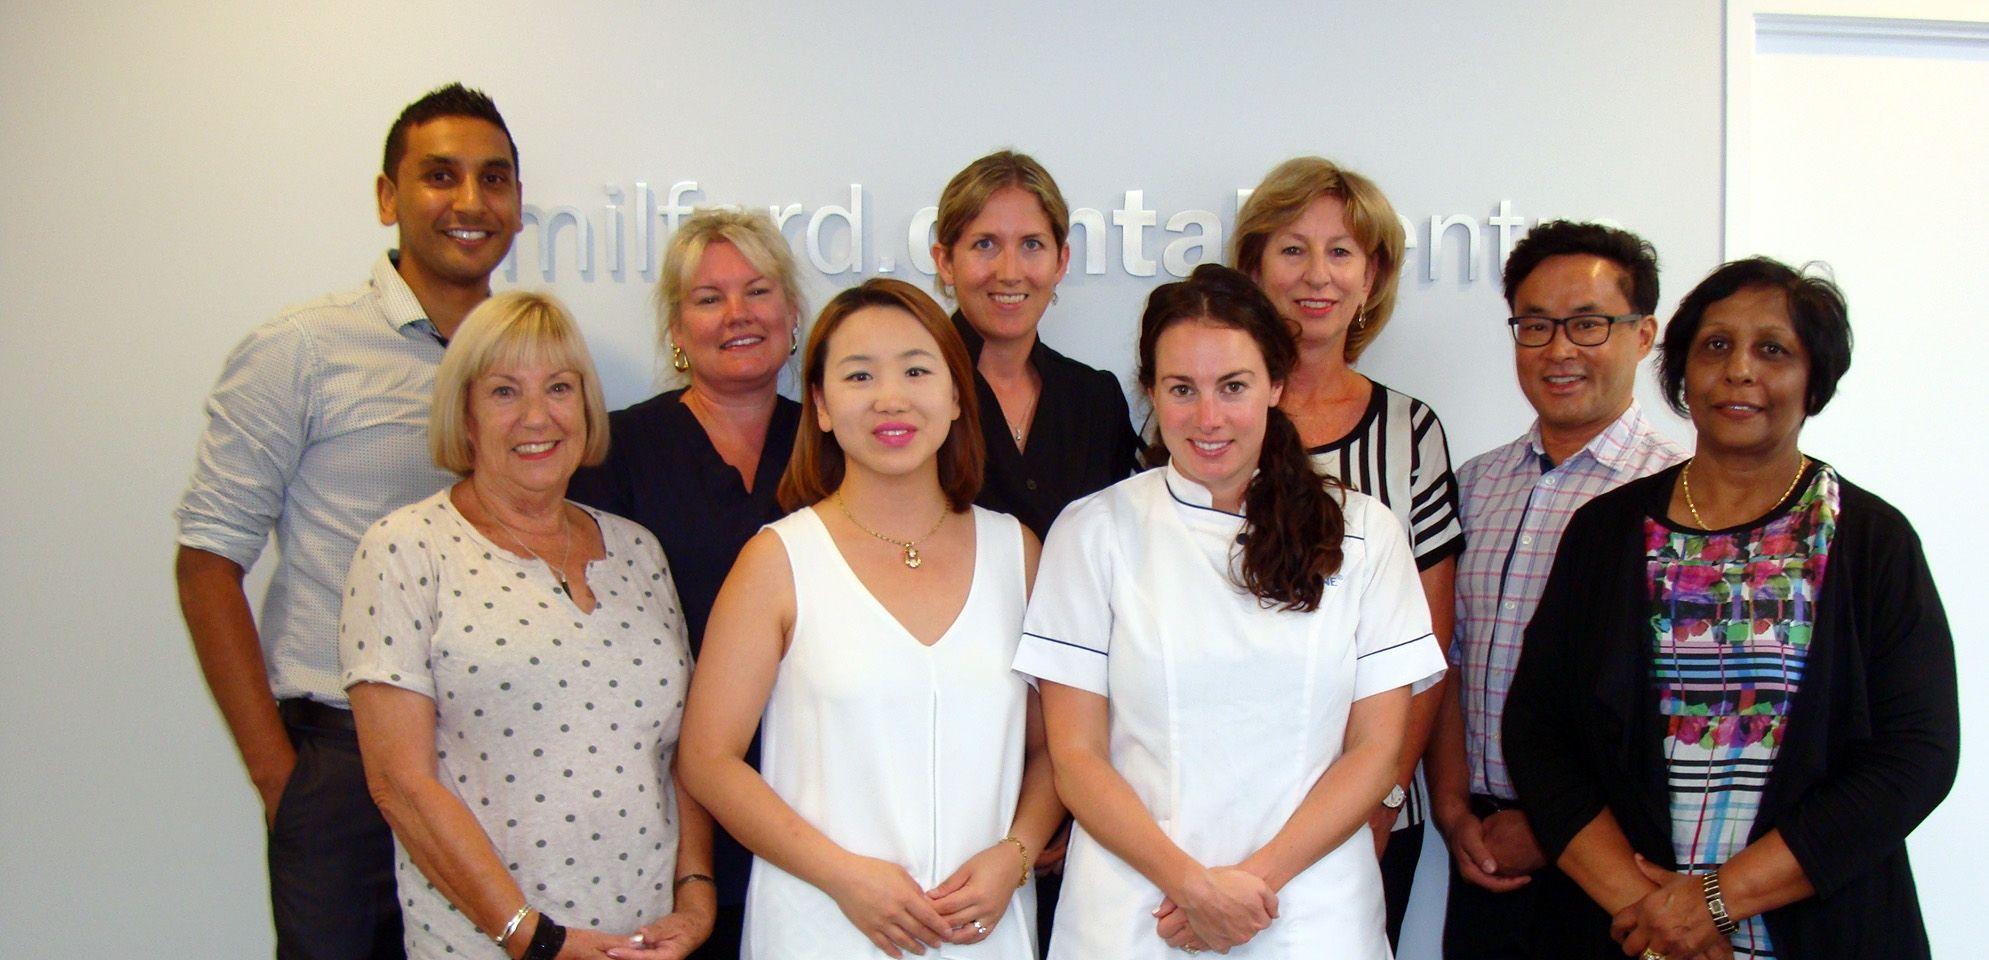 Milford Family Dental provides the affordable dental